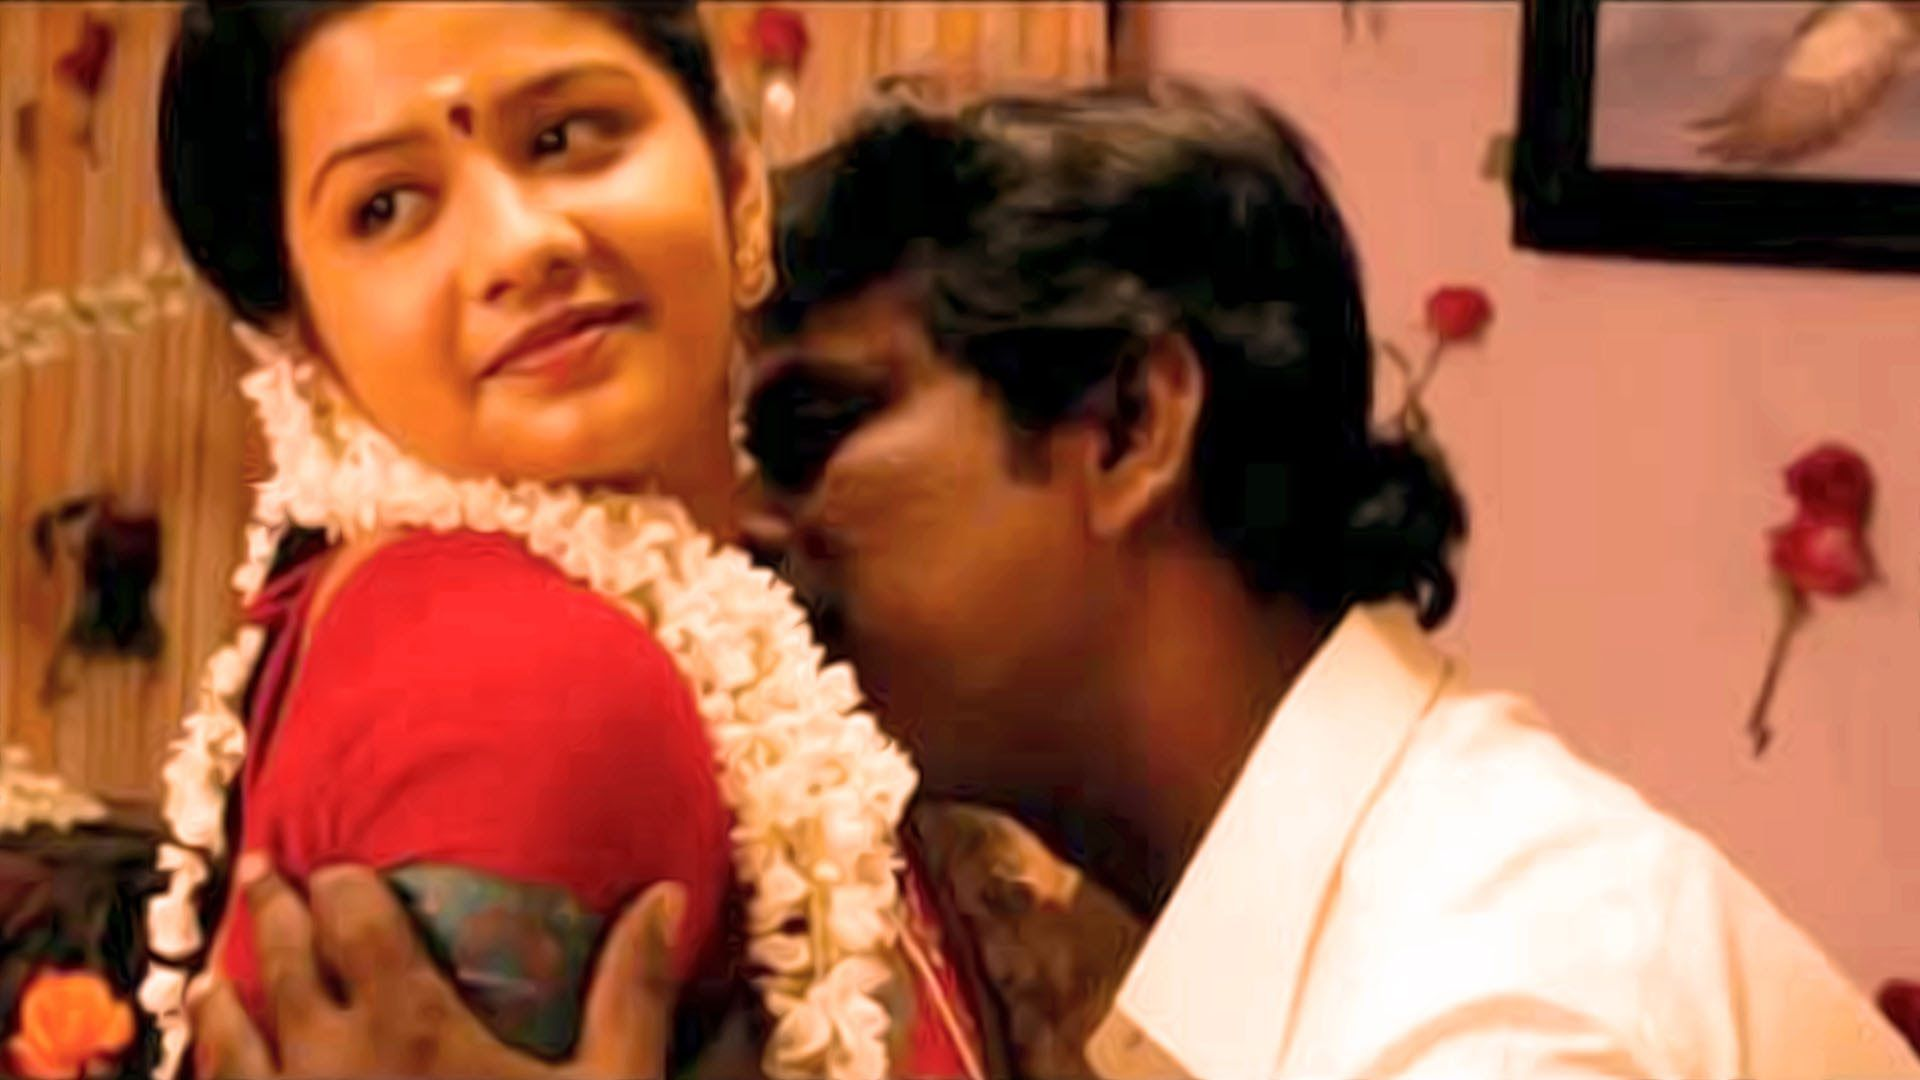 Mallu Desi Housewife Romance Ii 18 Ii Audlts Only Ii Tamil Latest Movie Bed Scene